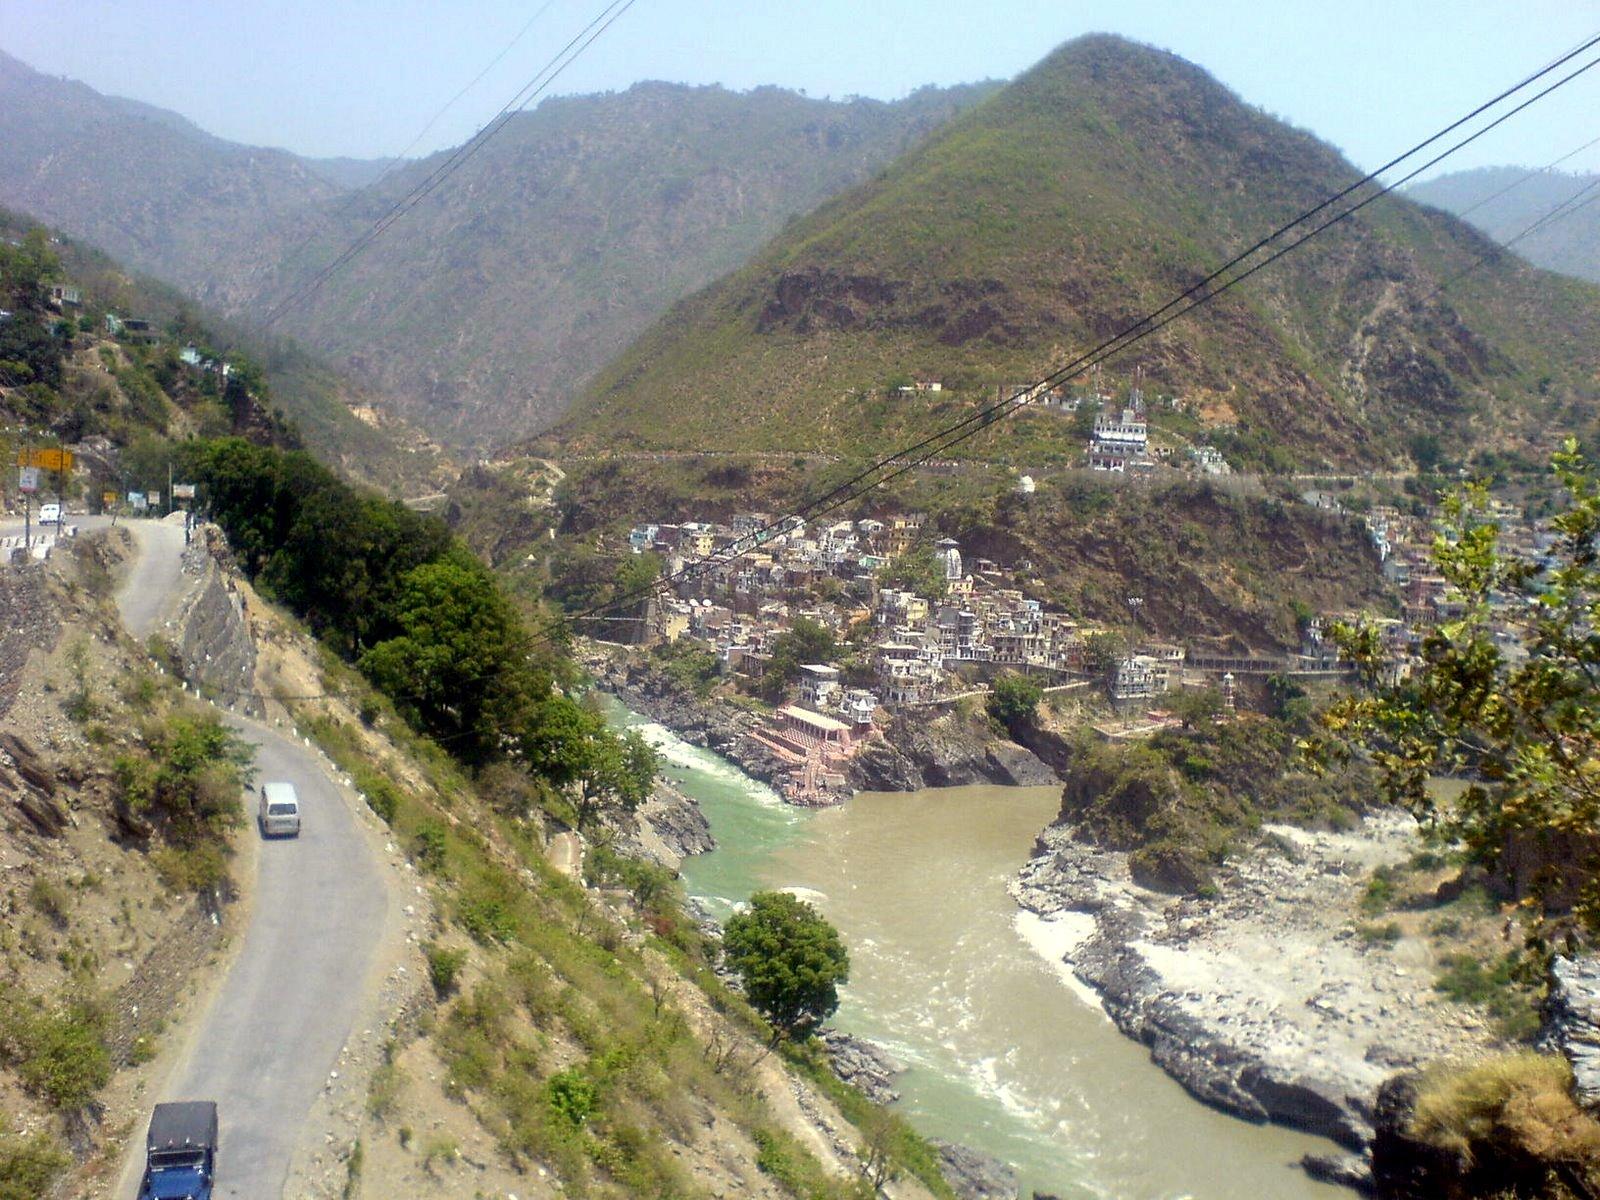 place where alaknanda and bhagirathi meet